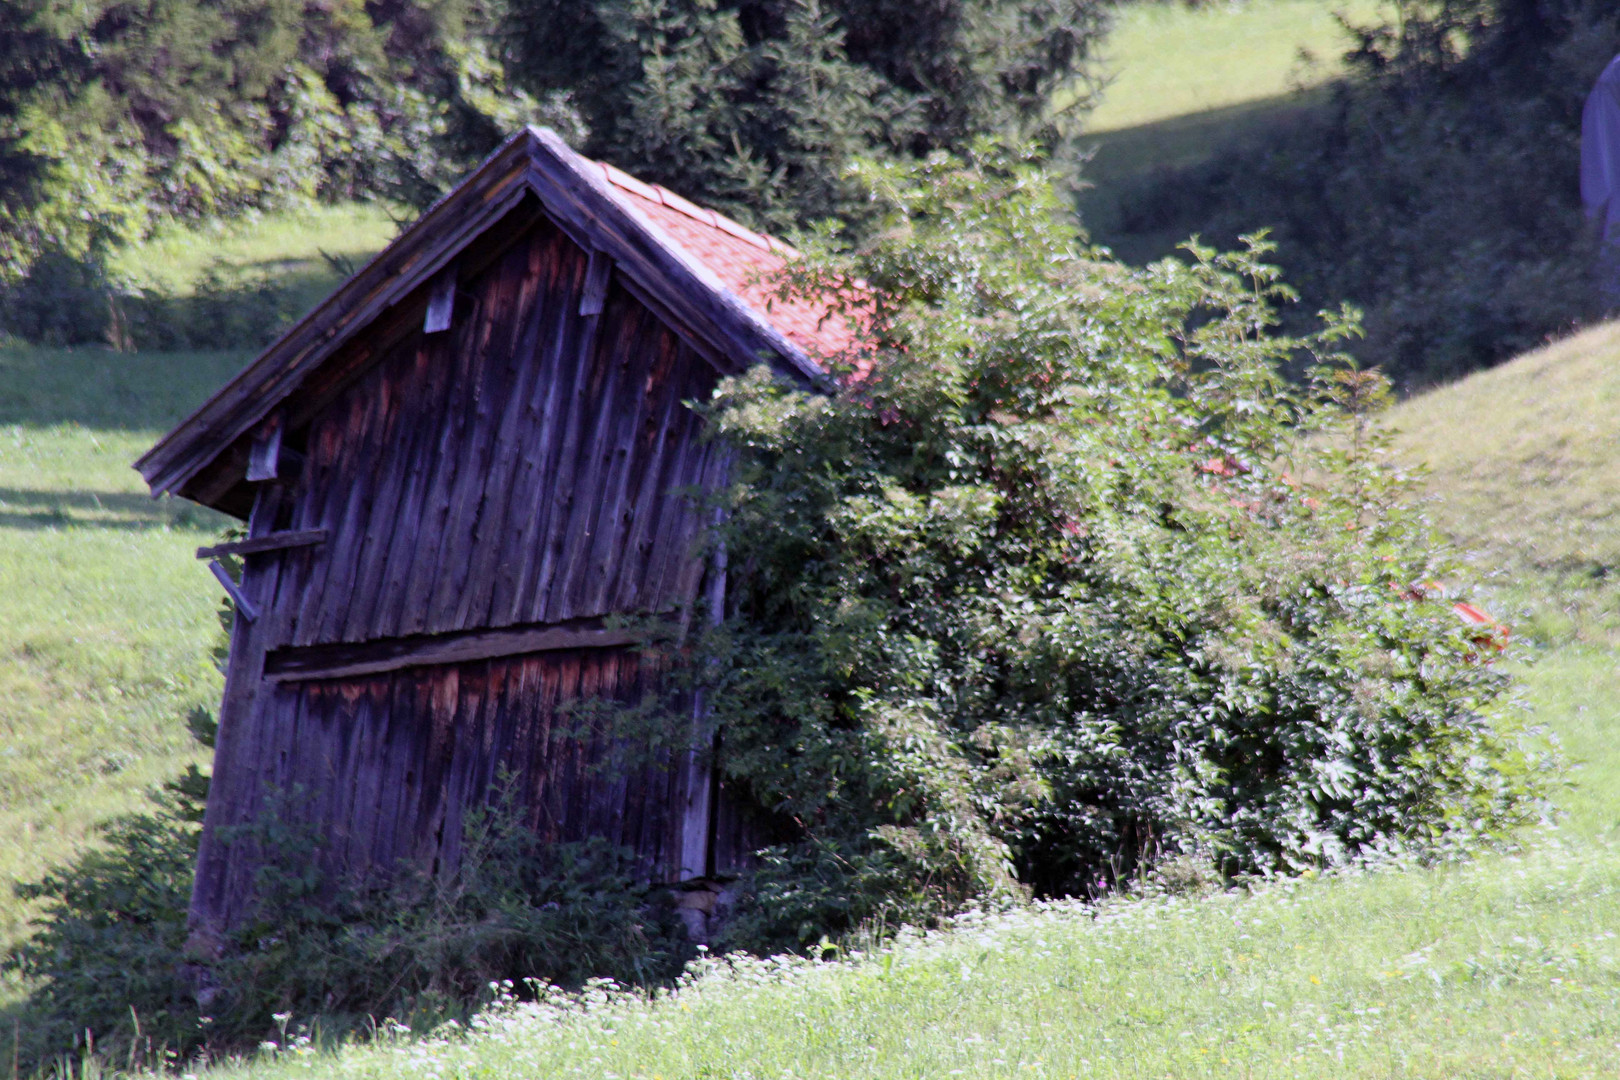 Hütte in Oberstdorf 2